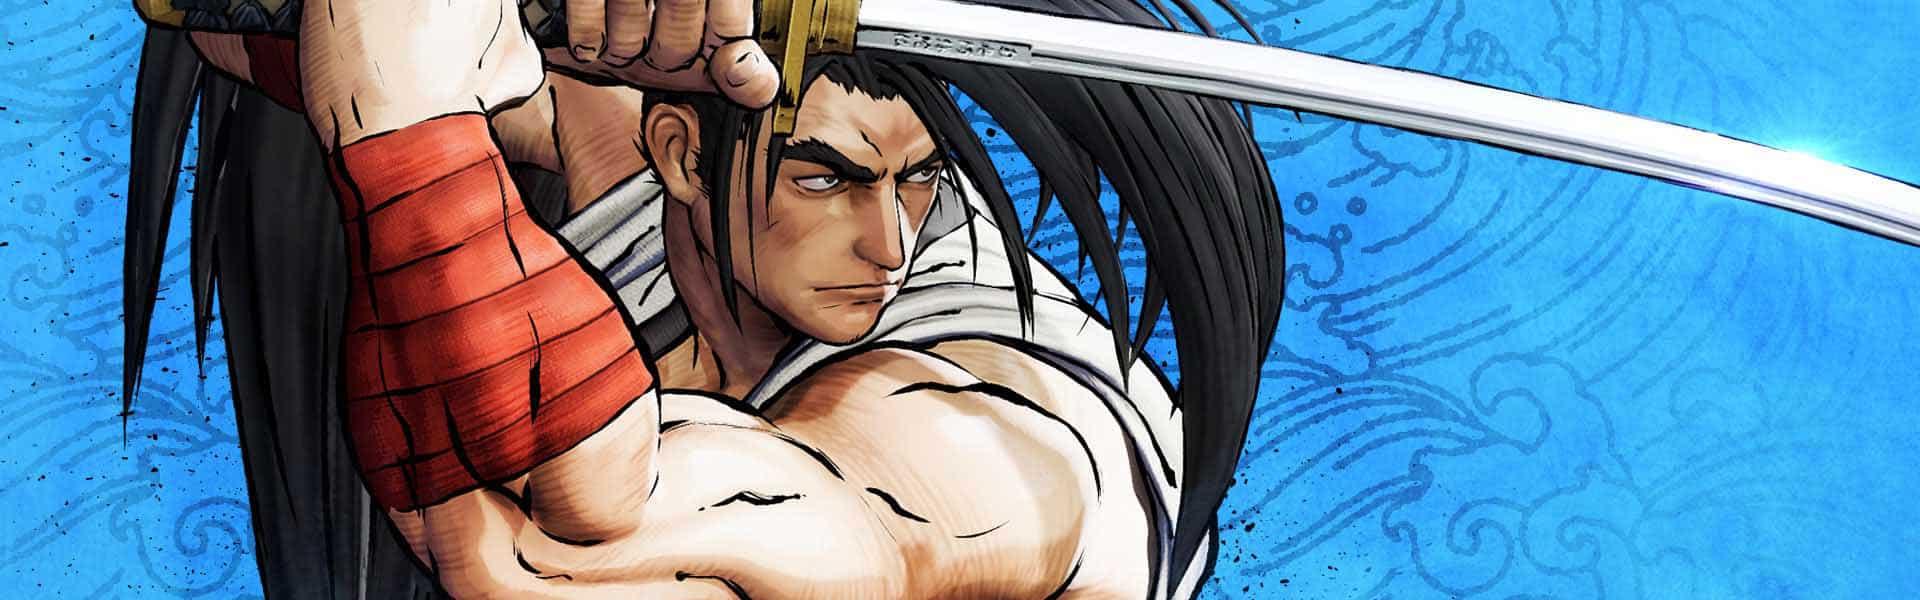 Samurai Shodown: Test